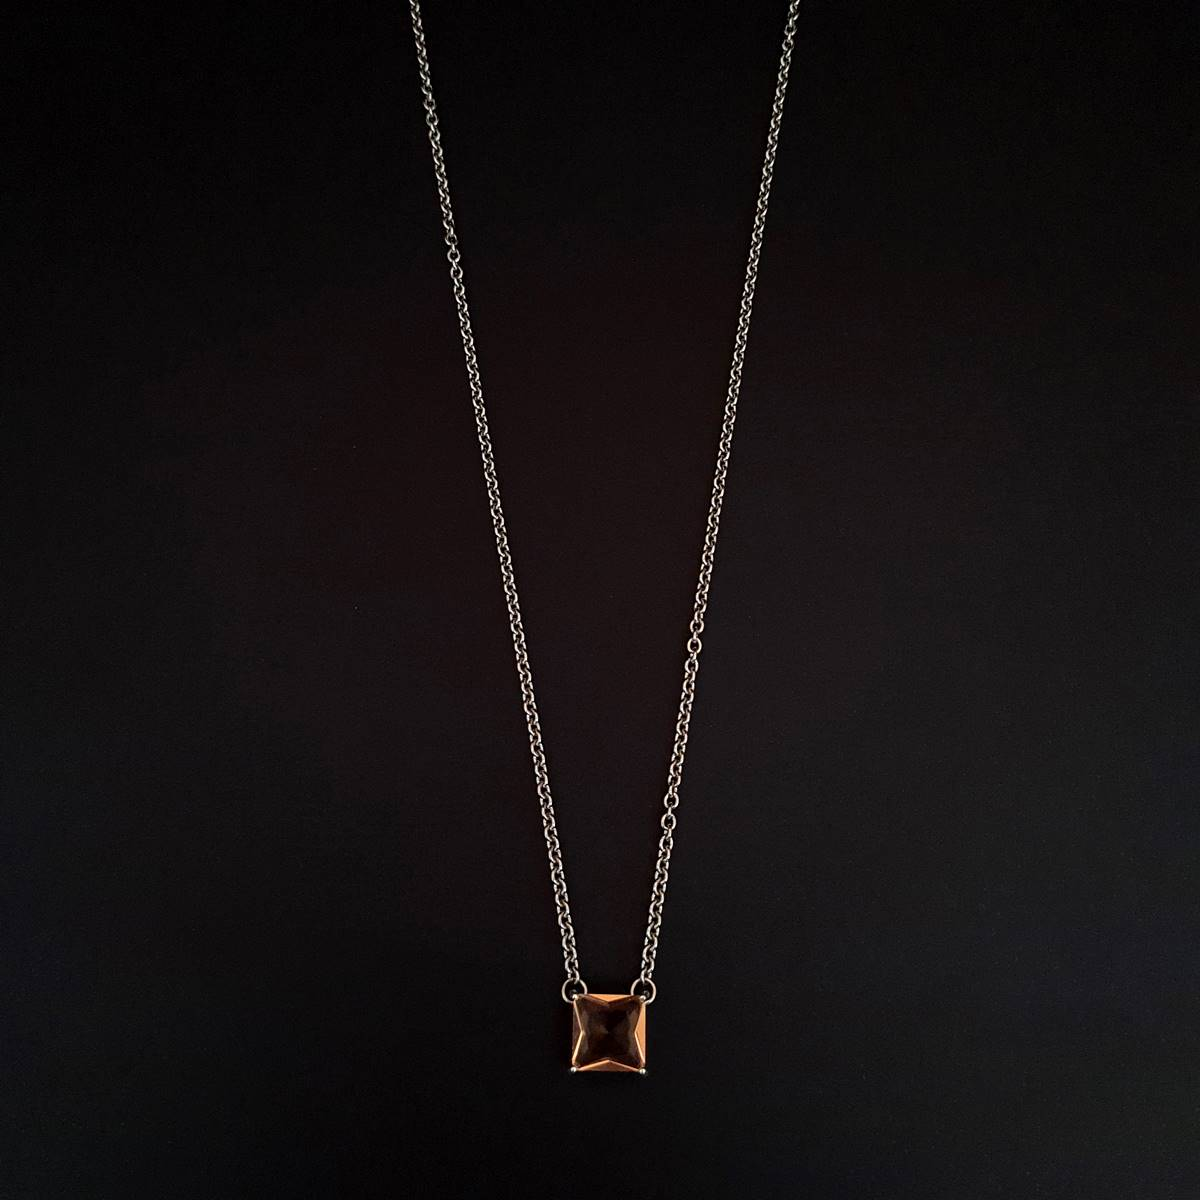 Corrente Aço Inox Precious Old Gold